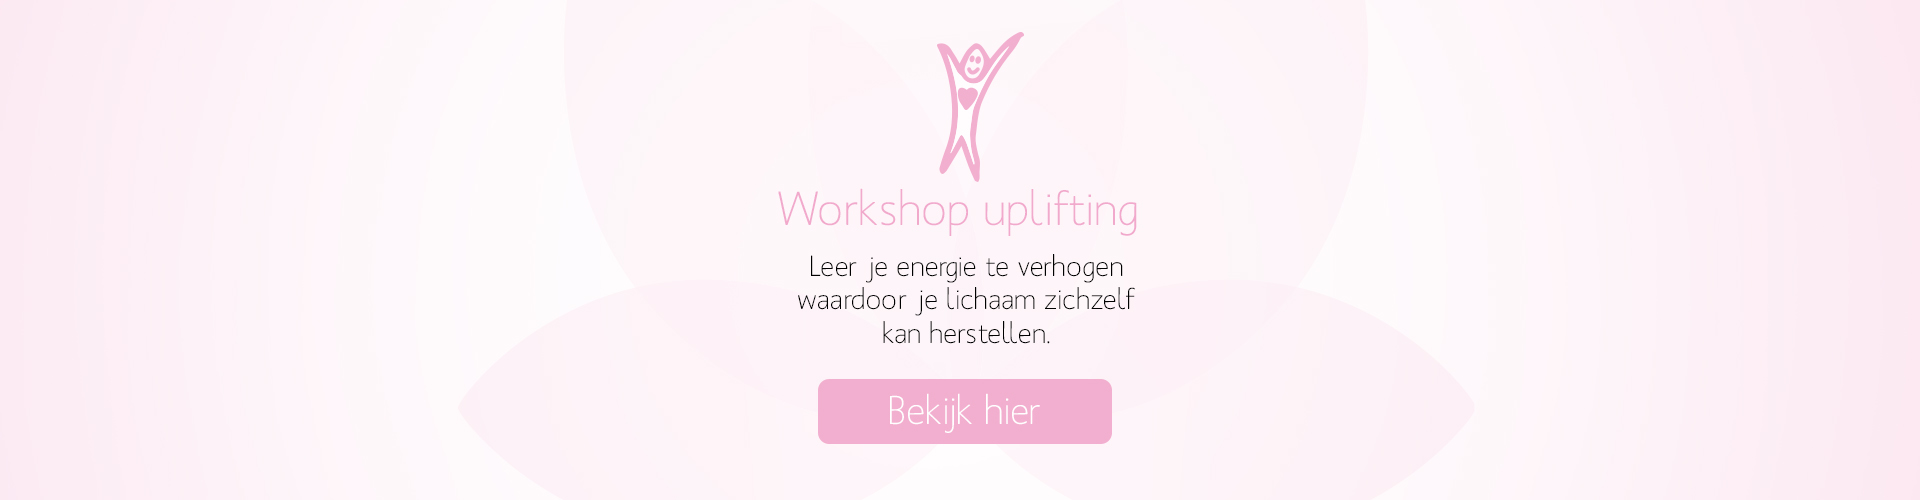 Workshop uplifting